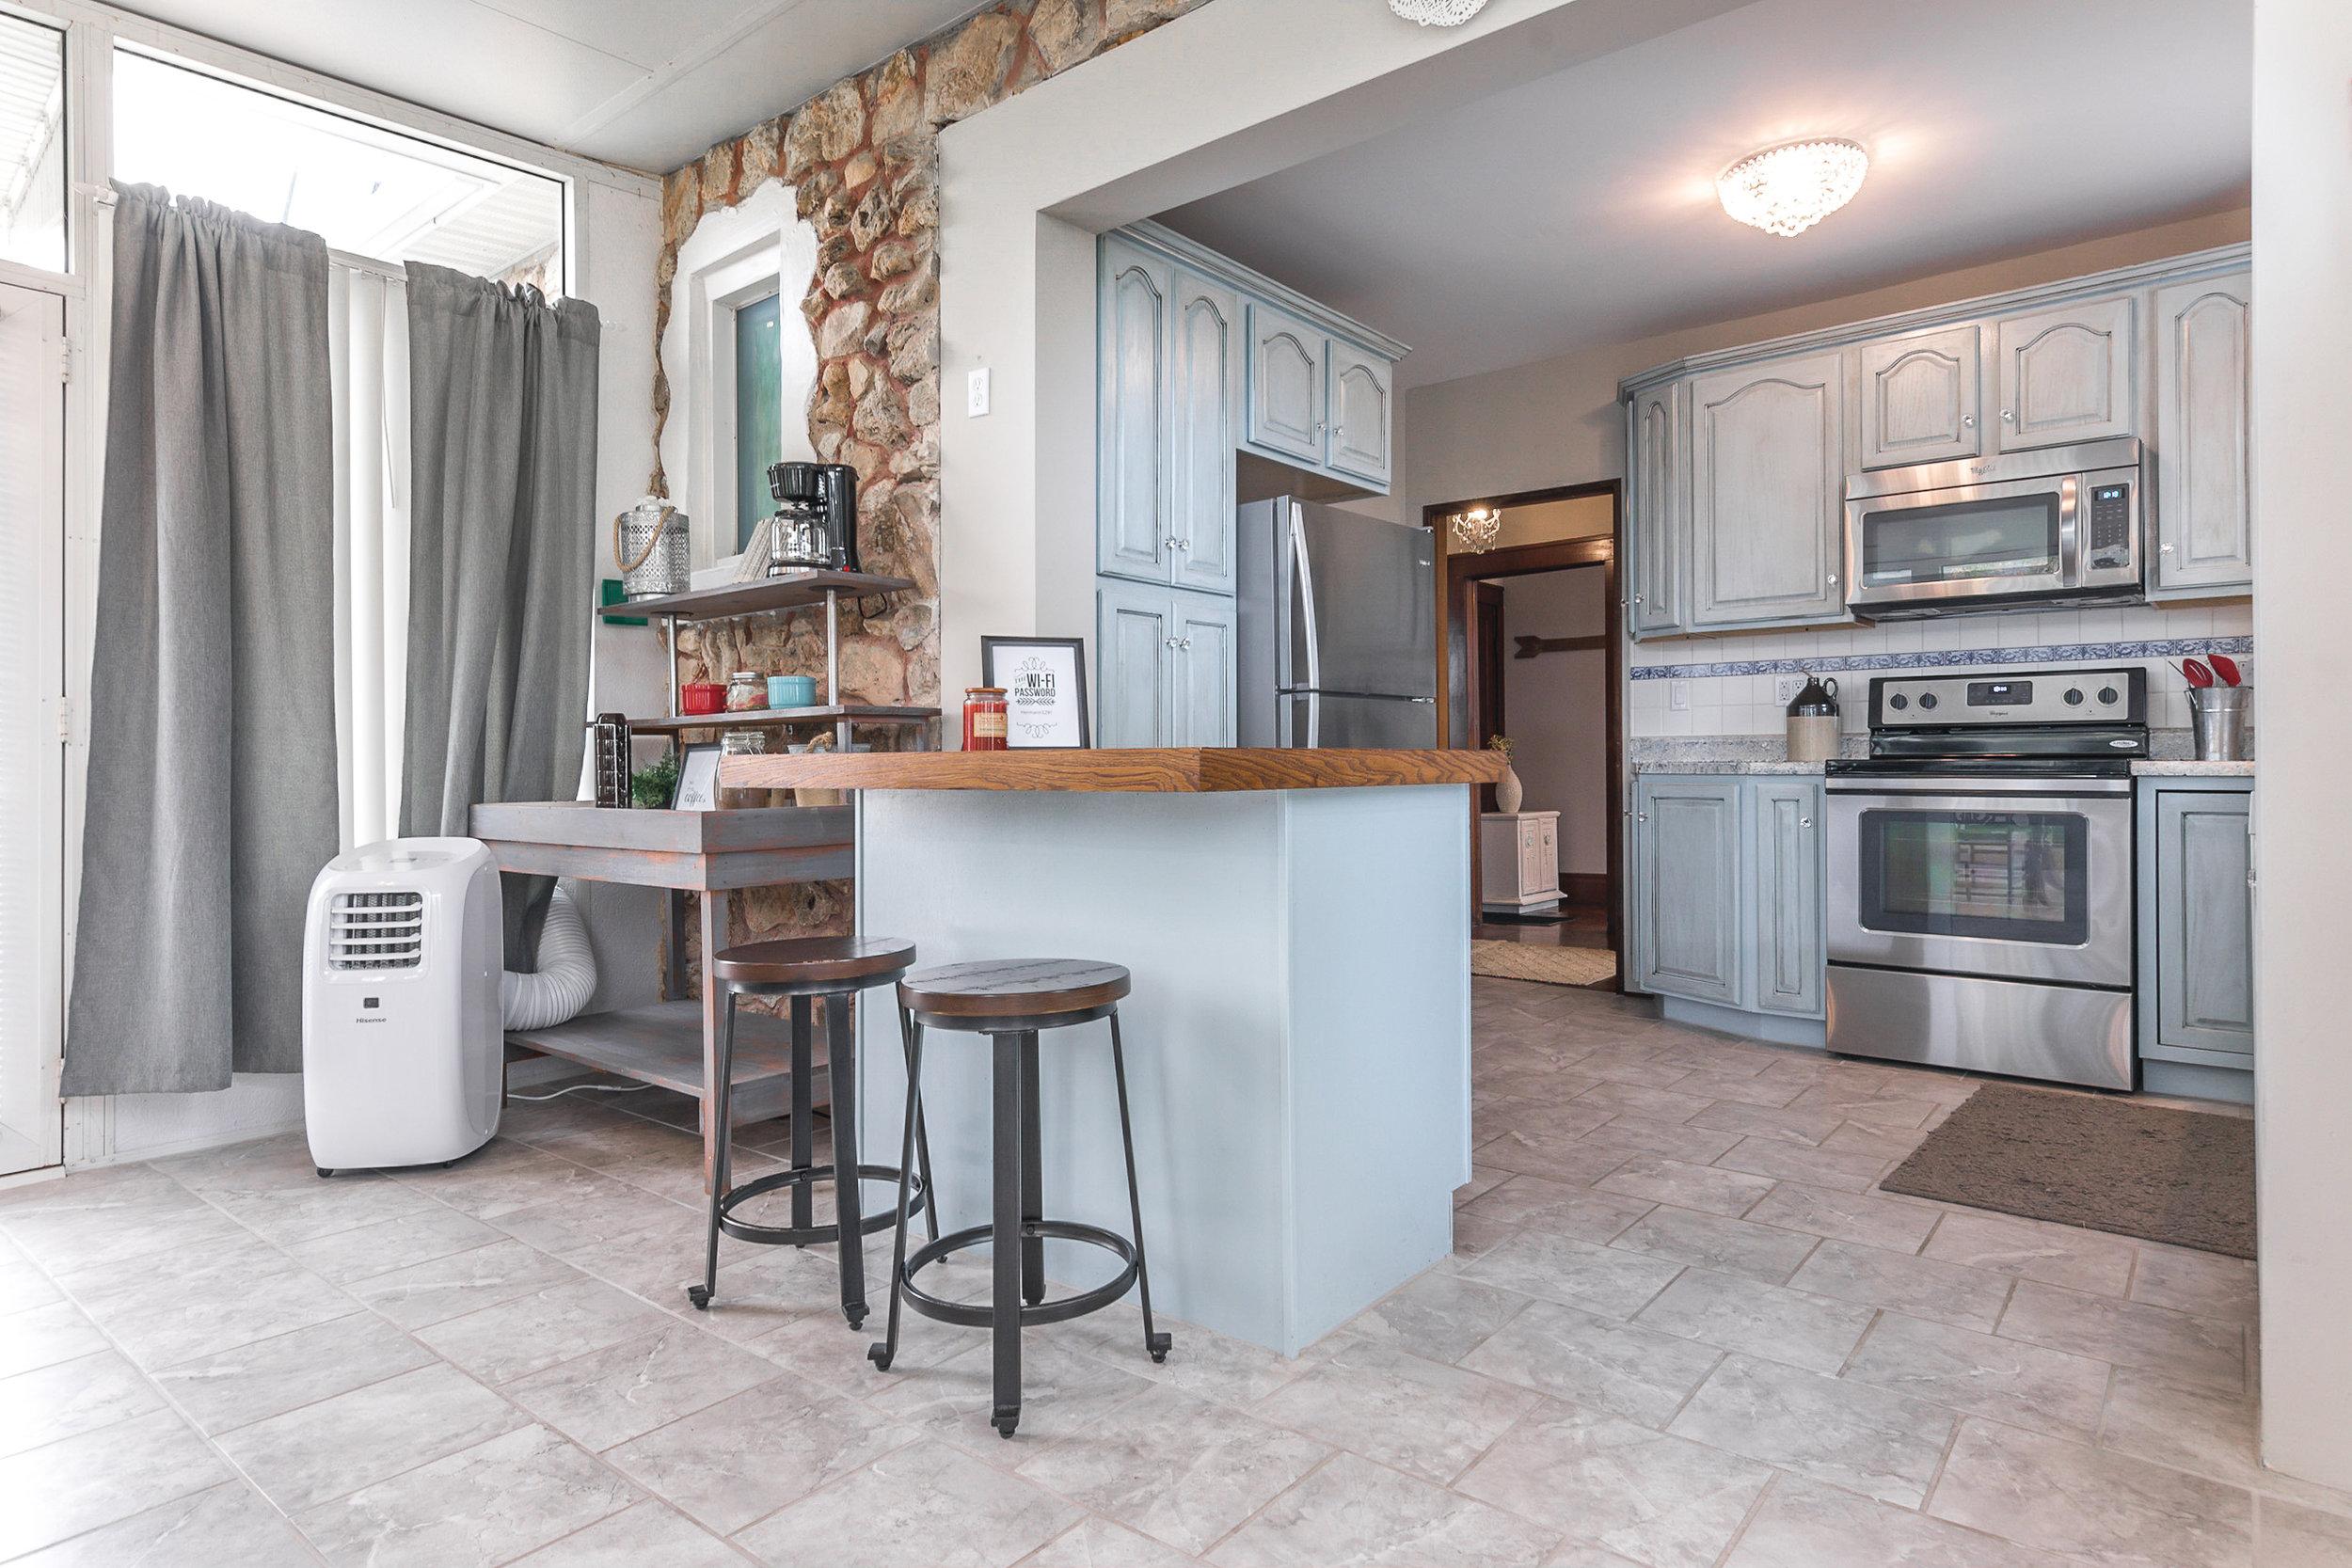 Stone-Cottage-Hermann-Missouri-vacation-rental-06-1082.jpg